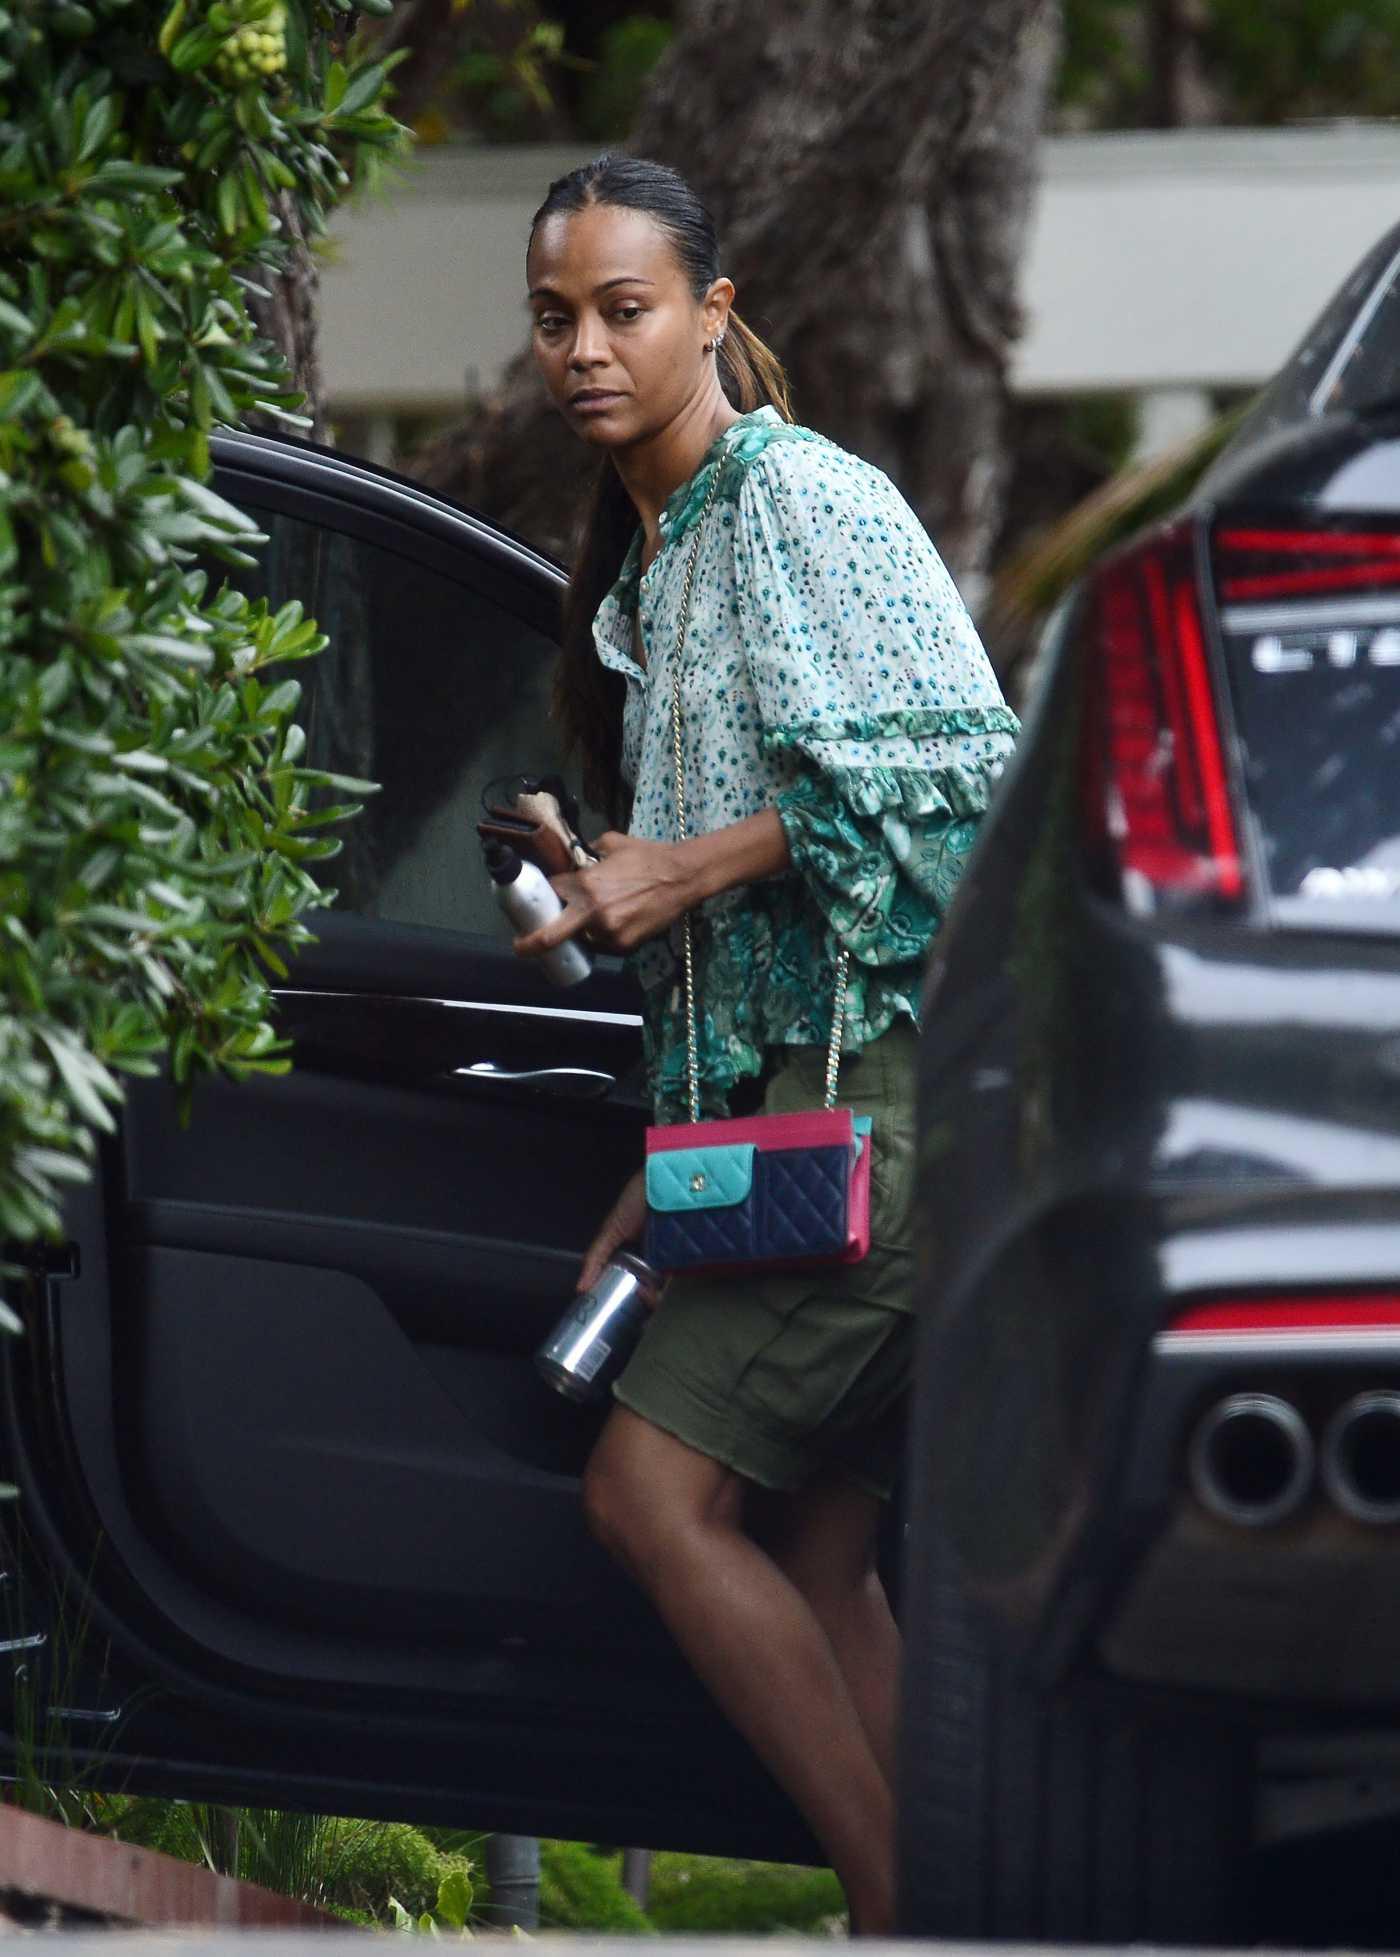 Zoe Saldana in a Silk Green Shirt Was Seen Out in Malibu 08/27/2020